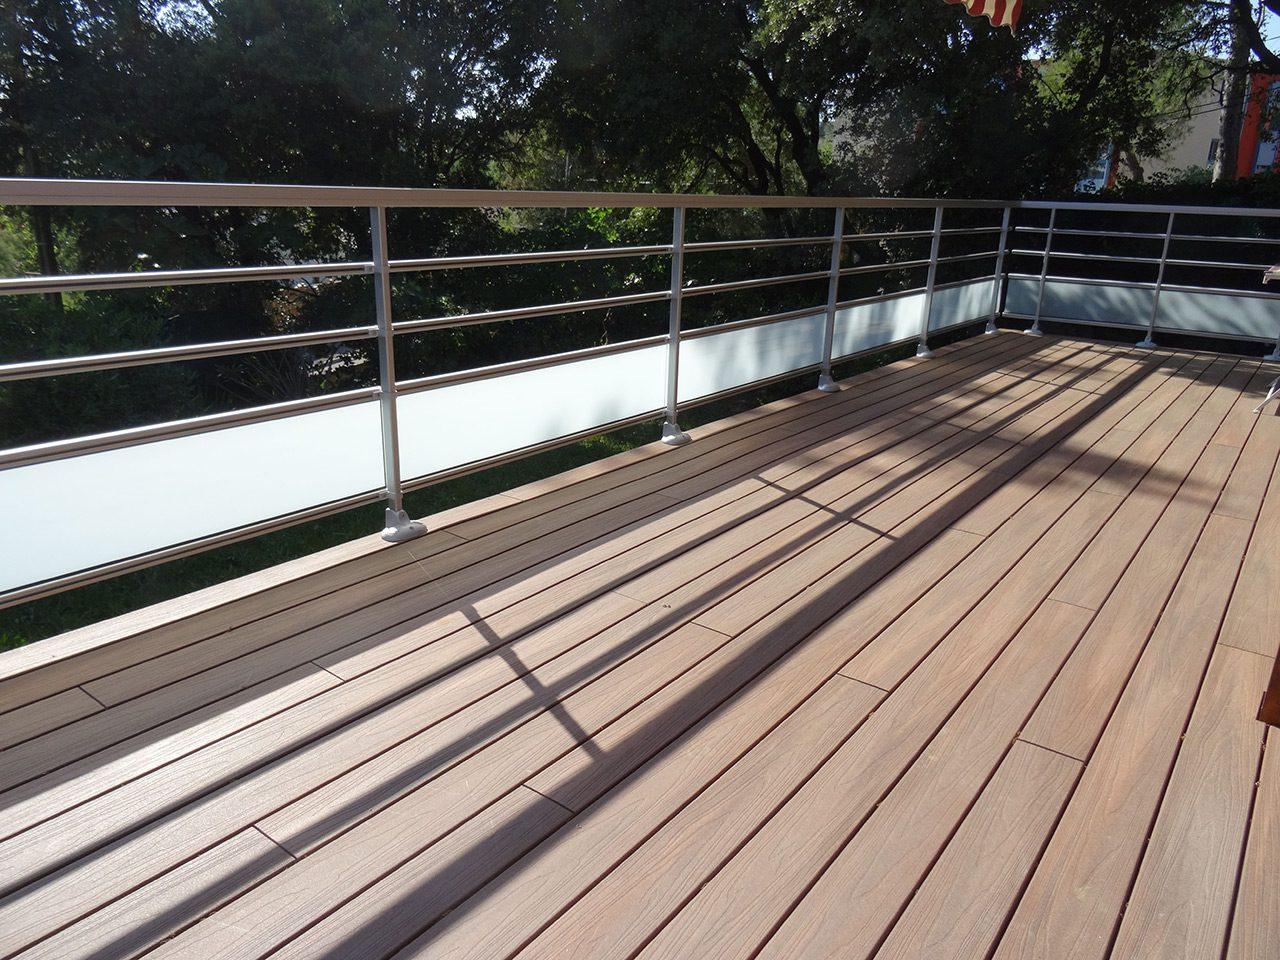 R novation et agrandissement d 39 une terrasse montpellier - Grand garage de l herault peugeot montpellier ...